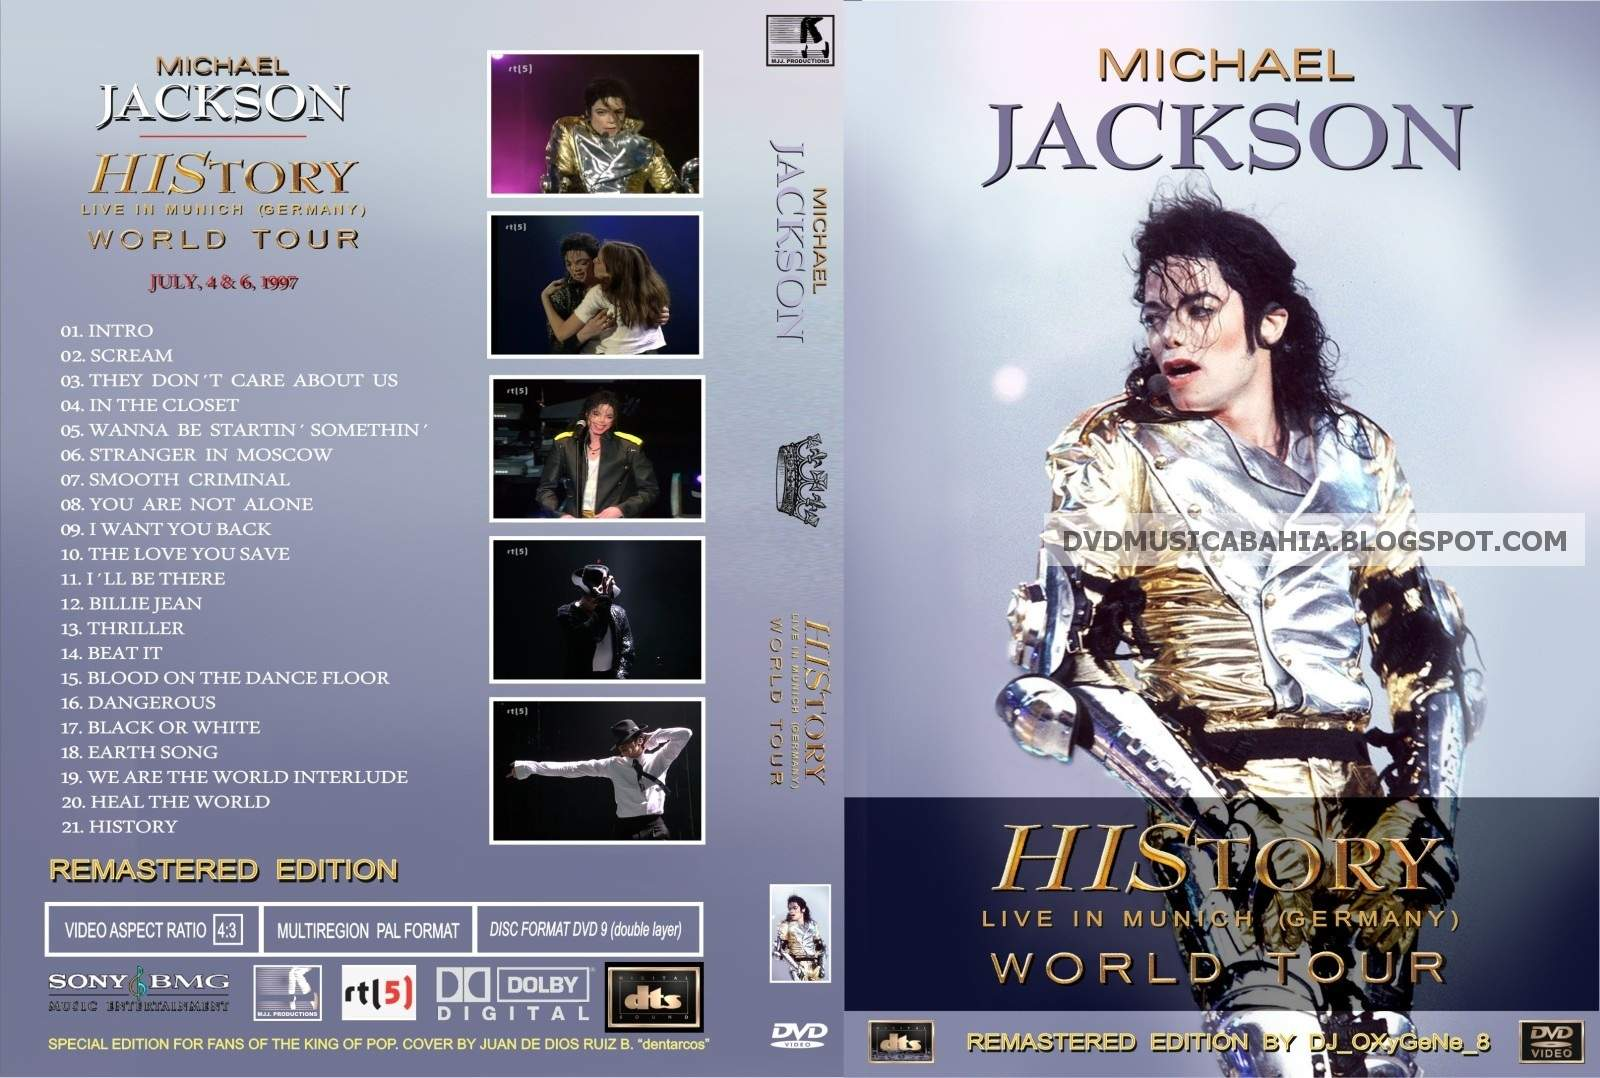 http://2.bp.blogspot.com/-WXOzCjYt19o/ThduyS8aqKI/AAAAAAAABrM/bB5E0hTGPKY/s1600/MICHAEL+JACKSON+-+HISTORY+LIVE+MUNICH+1997.jpg